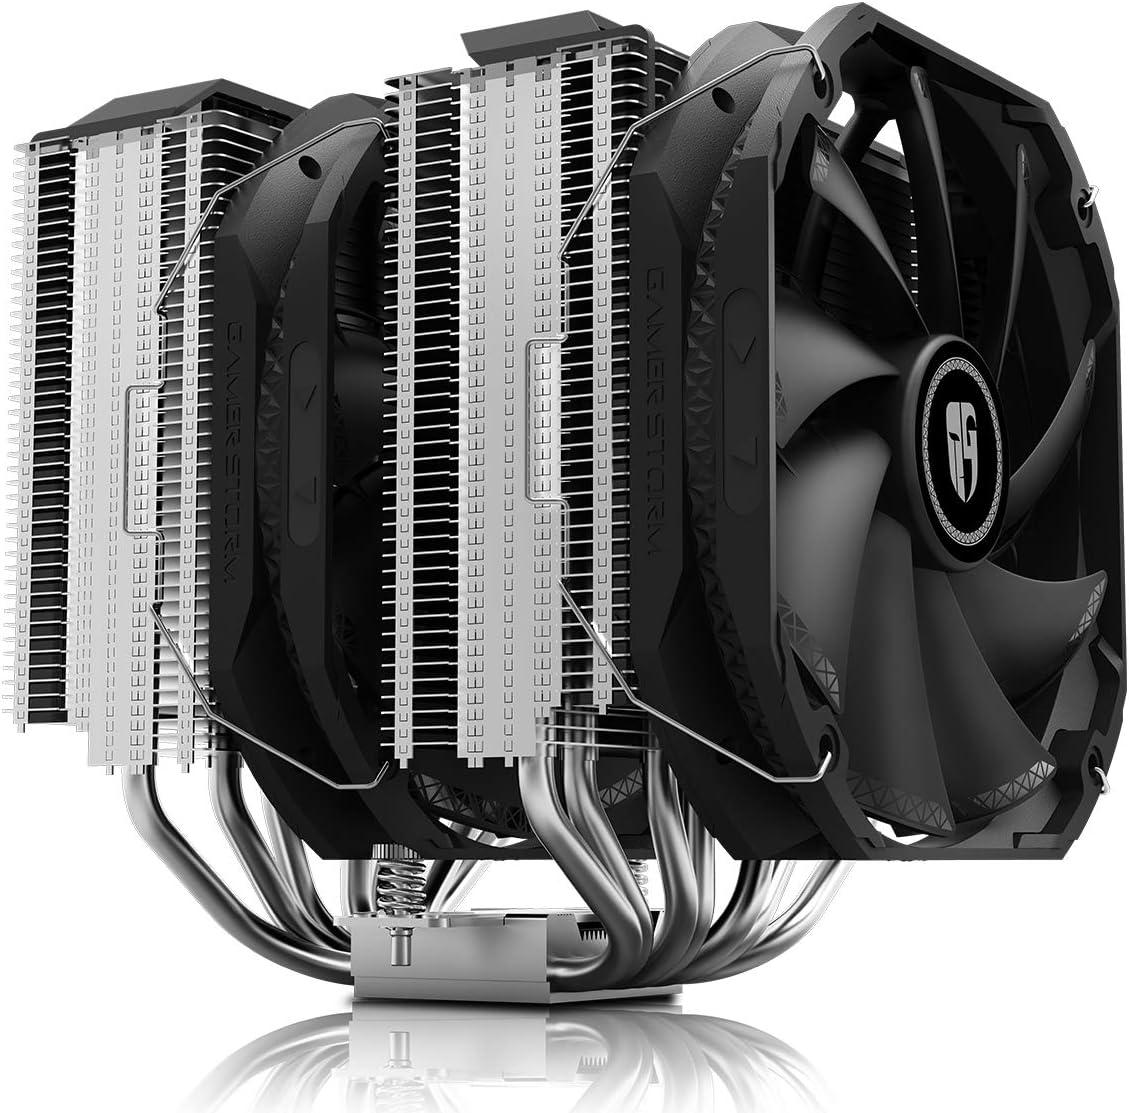 DEEP COOL Assassin III Air CPU Cooler, 7 Heatpipes, Dual 140mm Fans, 54mm RAM, 280W TDP, New Sinter Heatpipe Technology, 5-Year Warranty